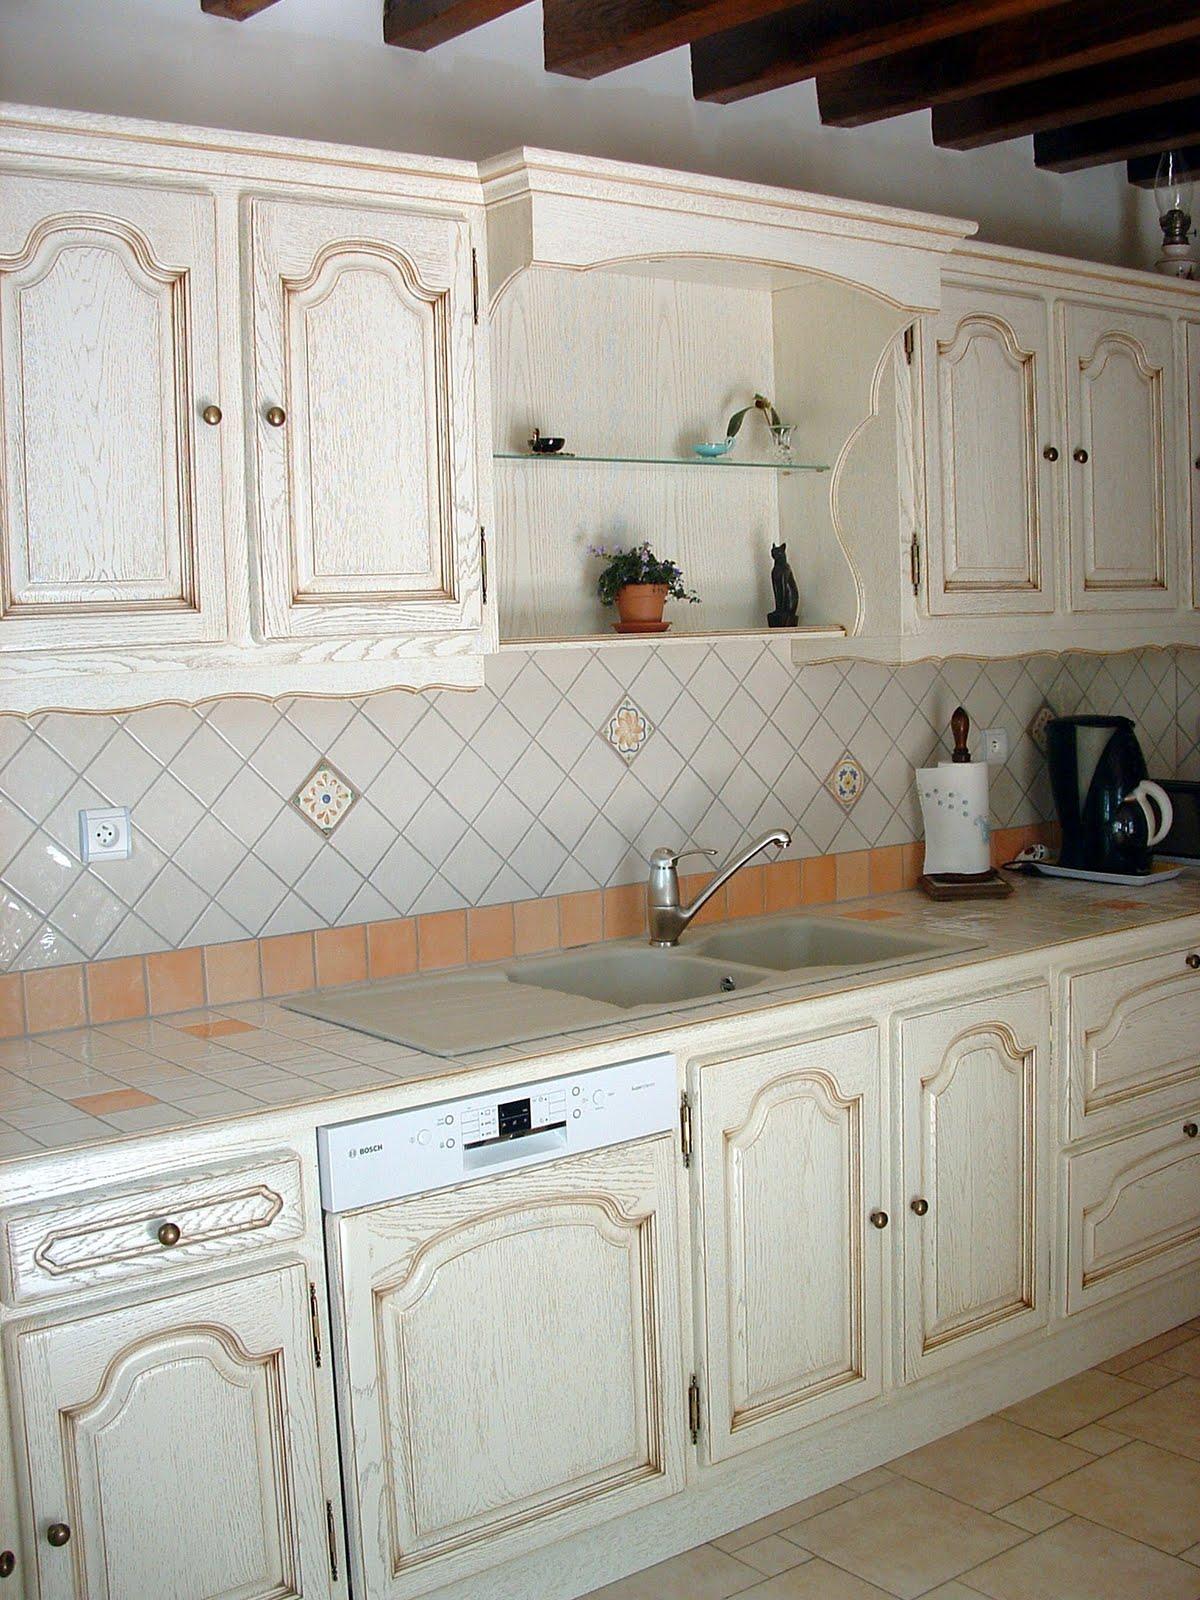 cuisine bruges blanc conforama cuisine calisson cadre droit with cuisine bruges blanc conforama. Black Bedroom Furniture Sets. Home Design Ideas